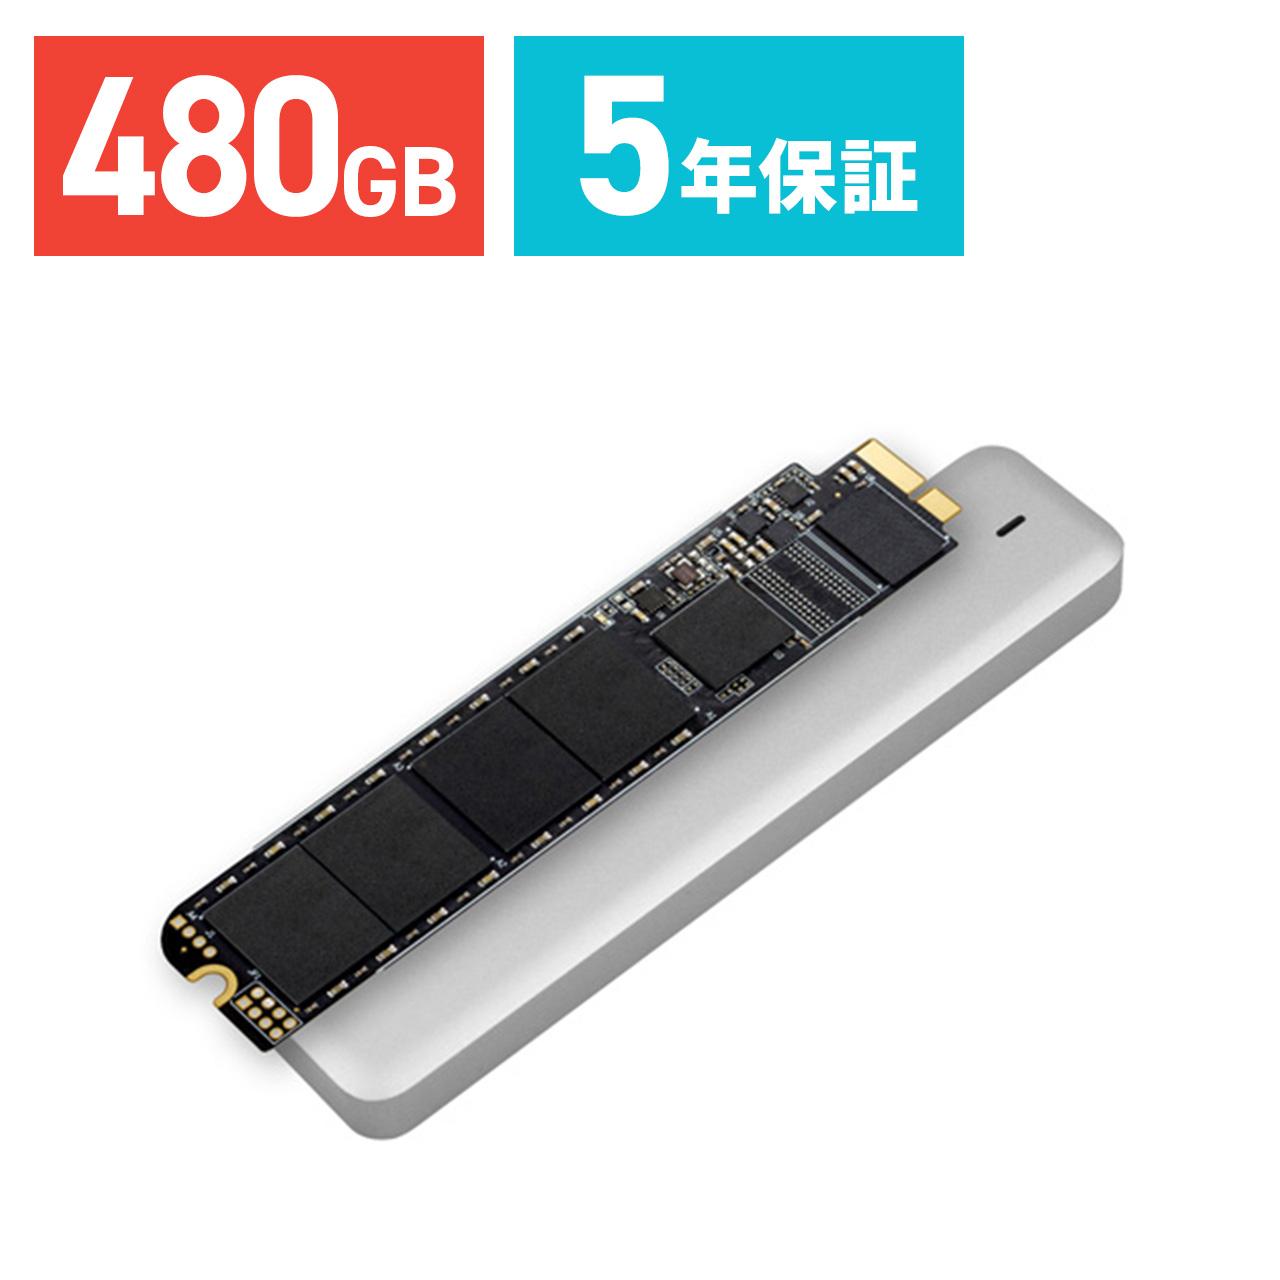 Transcend SSD Macbook Air専用アップグレードキット 480GB JetDrive 500 SATAIII対応 [TS480GJDM500]【送料無料】